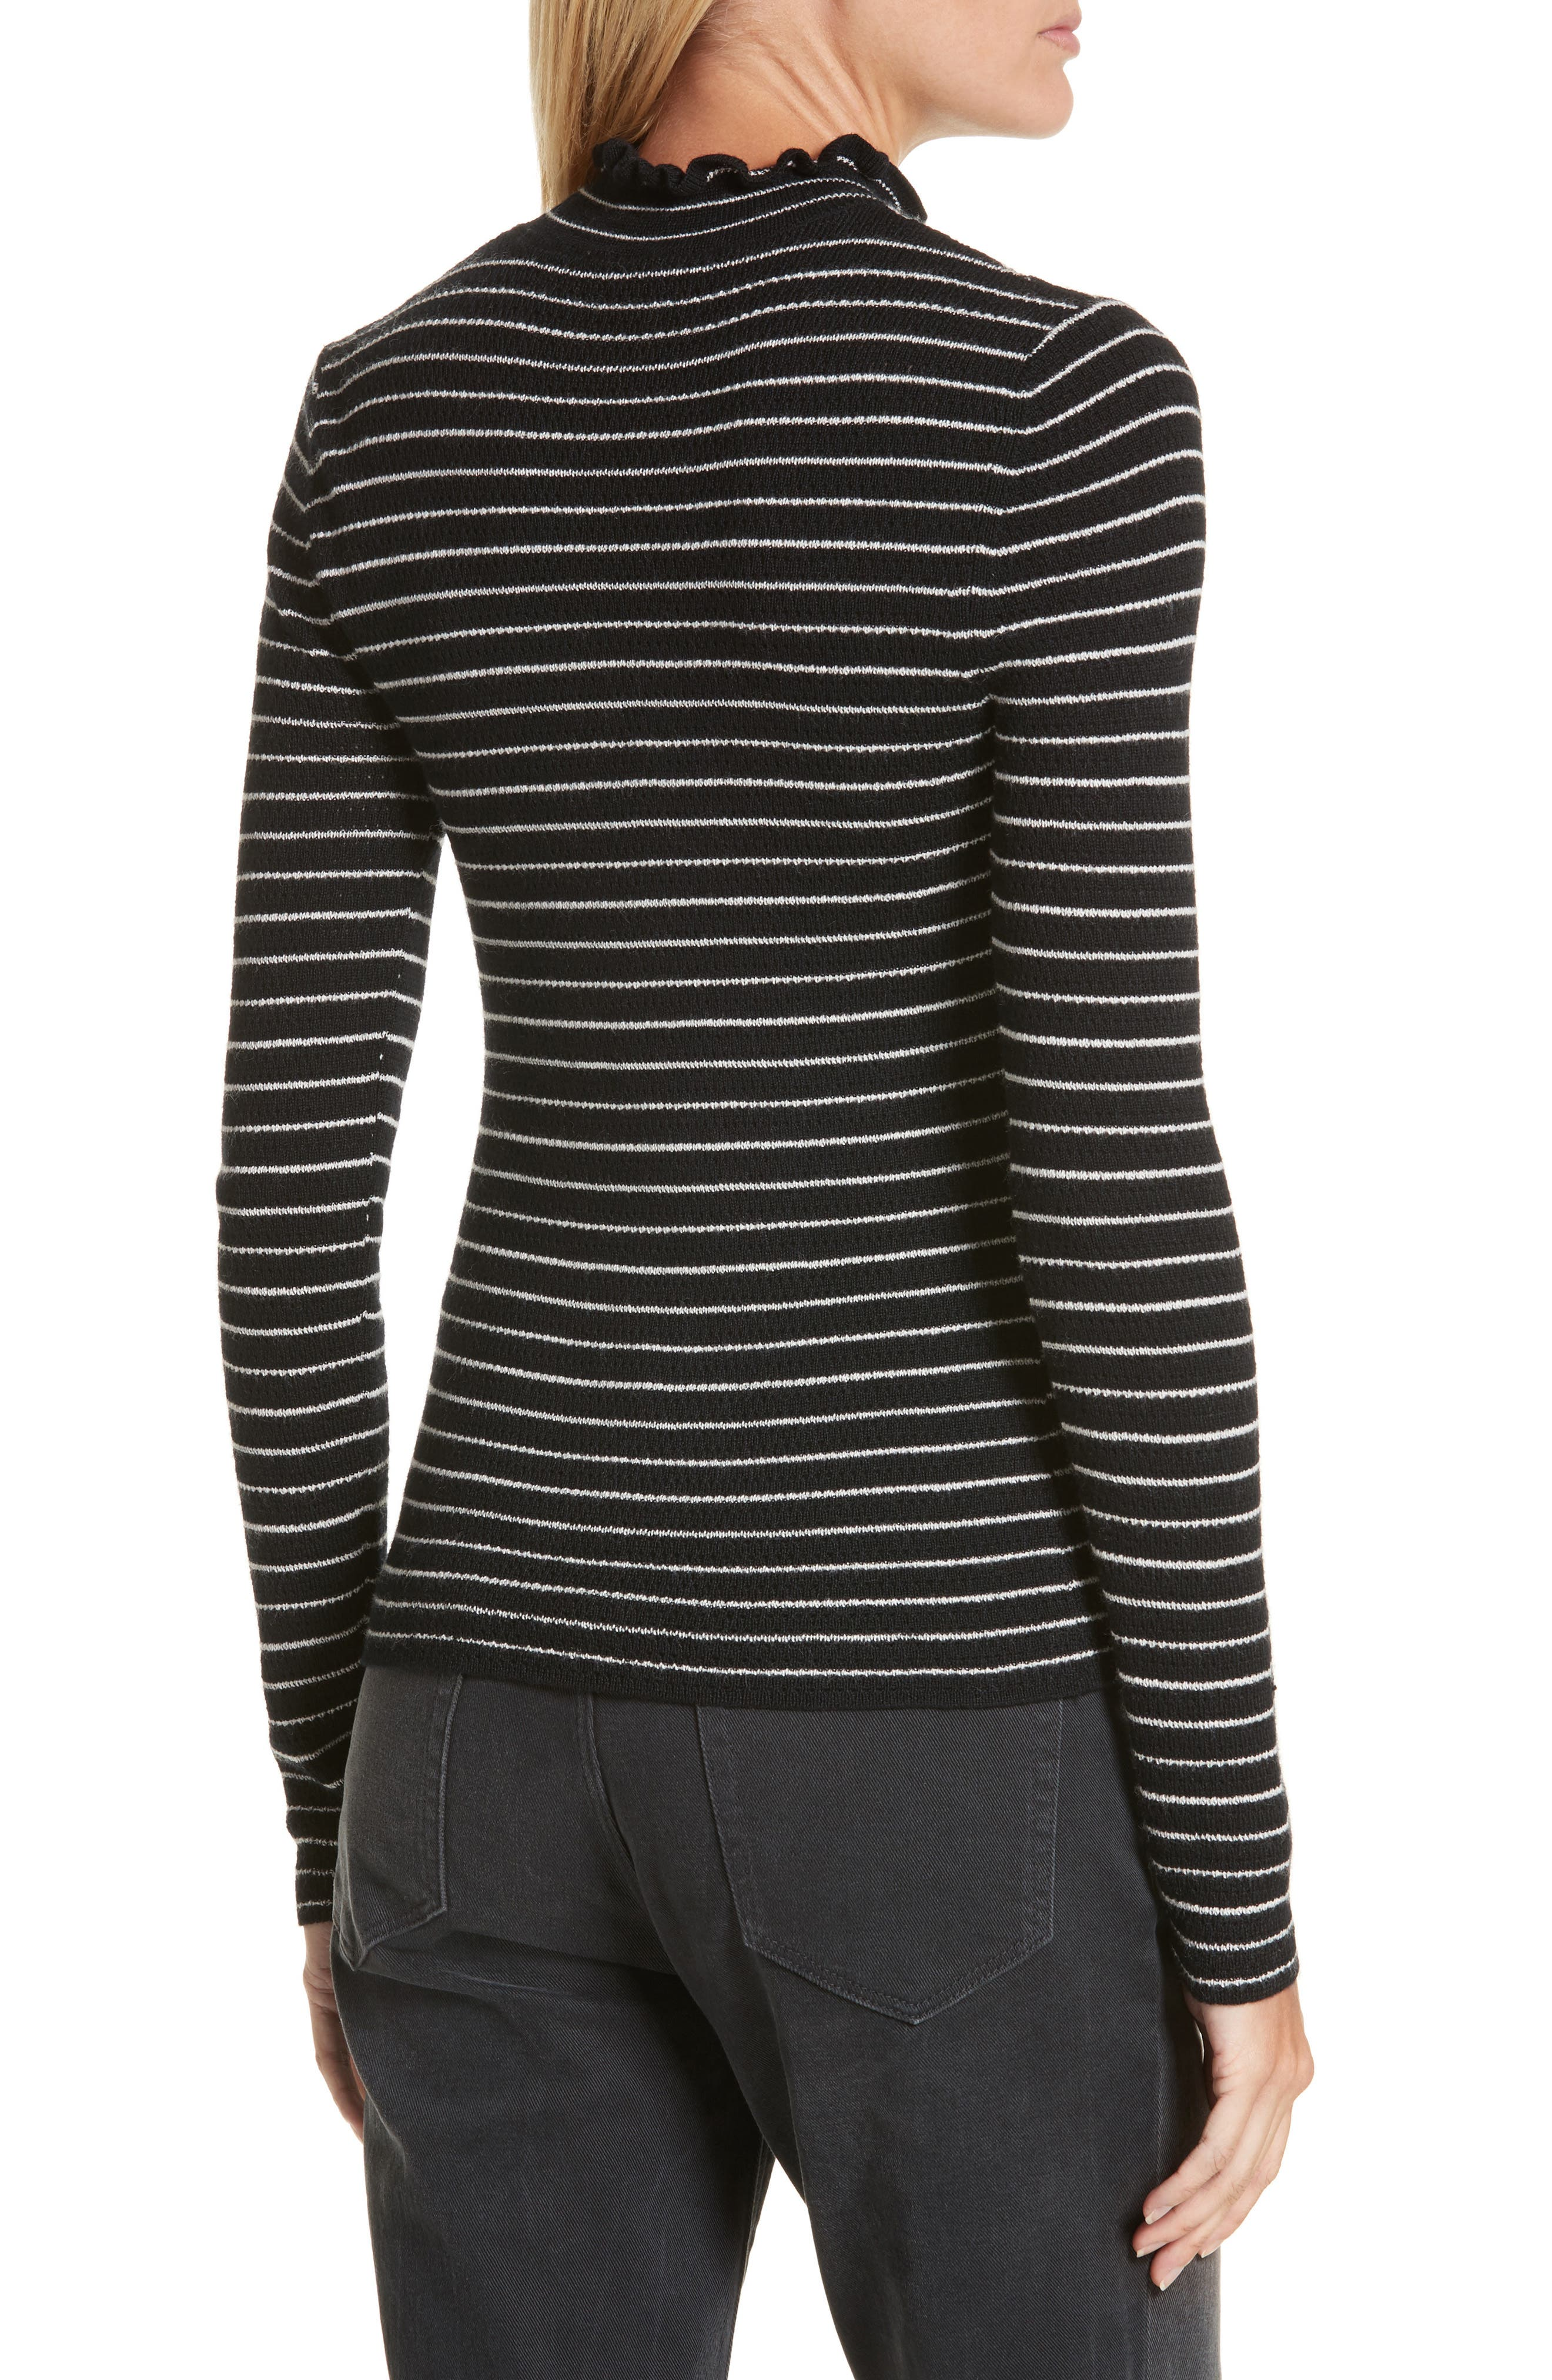 Merino Wool Pullover,                             Alternate thumbnail 2, color,                             Black Stripe